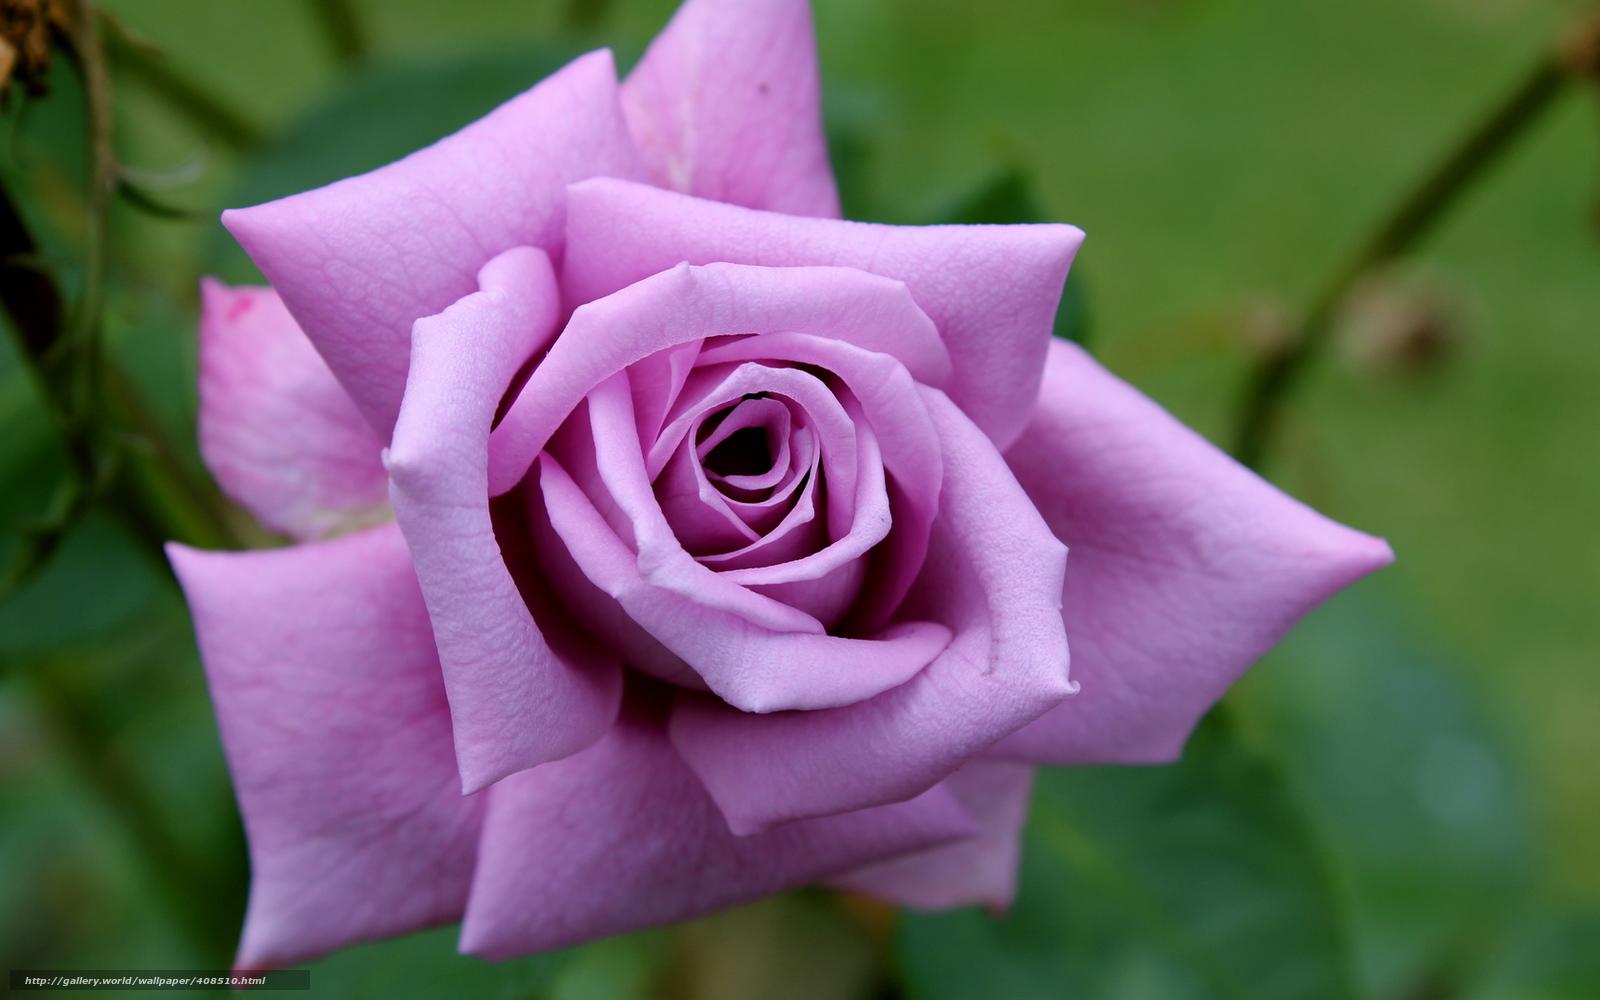 Flores Lilas Con Rosas Sobre Fondo: Descargar Gratis Flor, Rosa, Rosa, Lila Fondos De